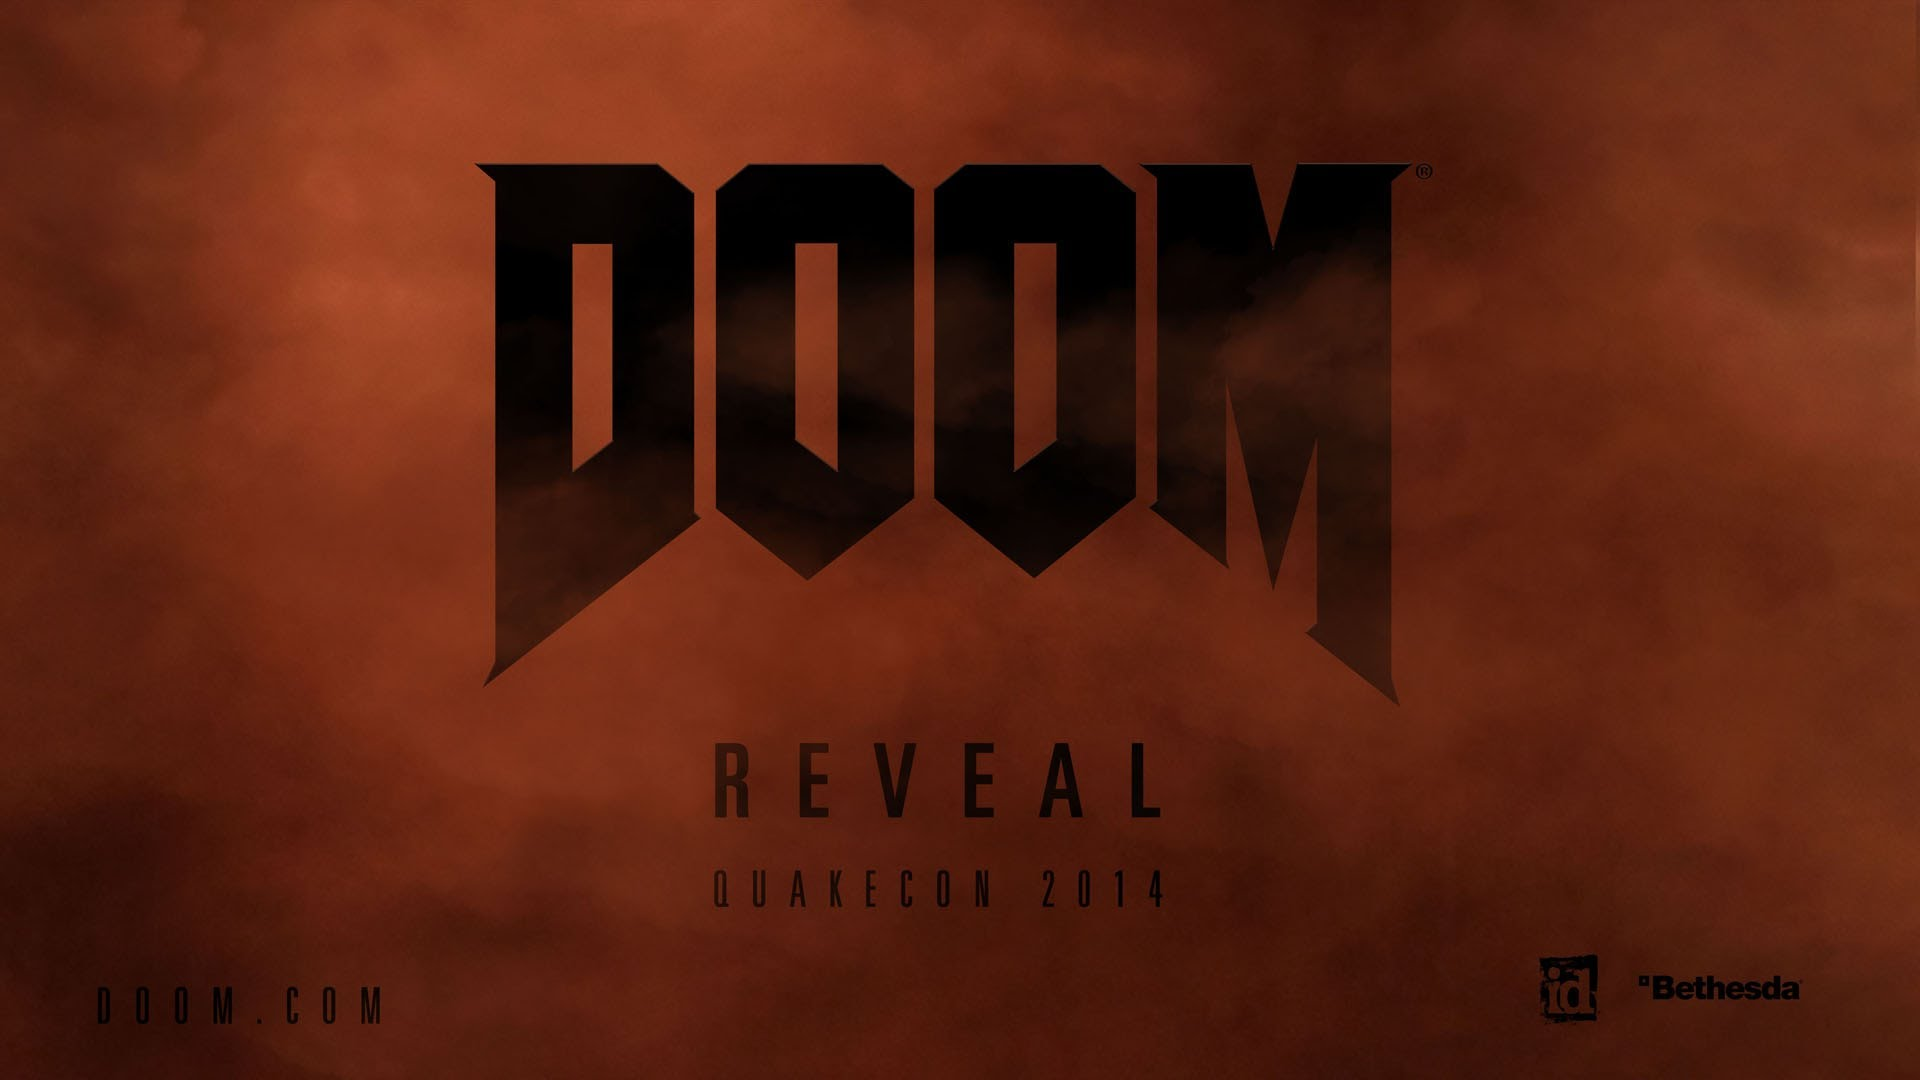 1400x900 Doom 4 Game Poster 1400x900 Resolution Hd 4k